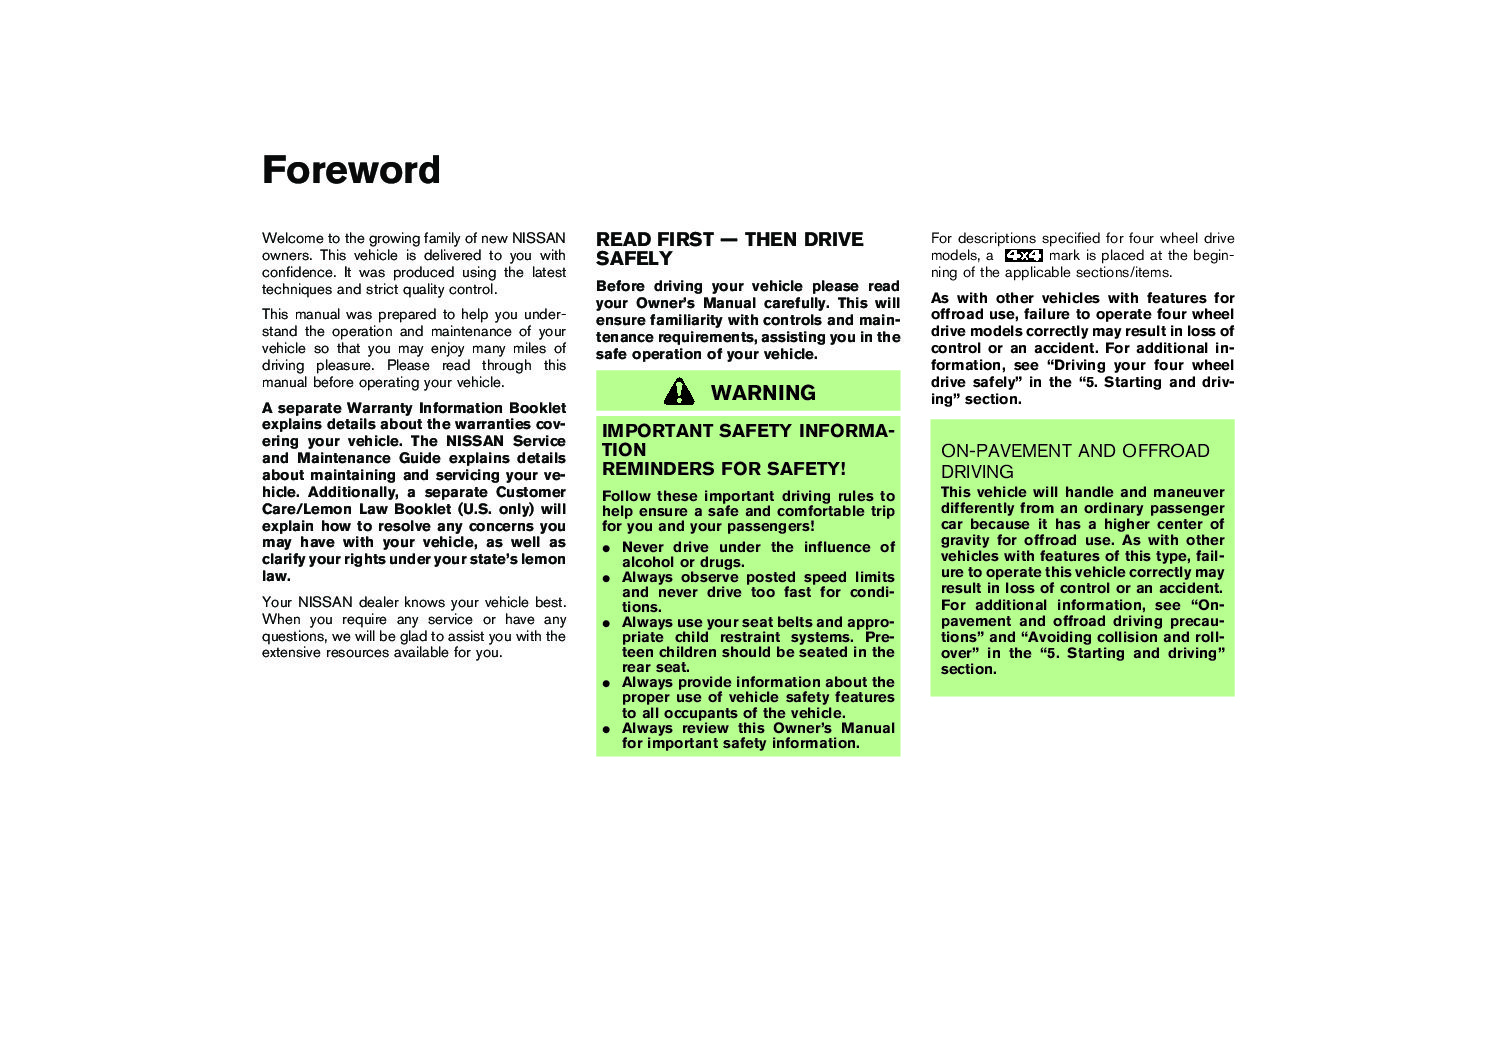 2004 nissan pathfinder owners manual just give me the damn manual rh justgivemethedamnmanual com 2014 nissan pathfinder owners manual used 2004 nissan pathfinder owners manual pdf